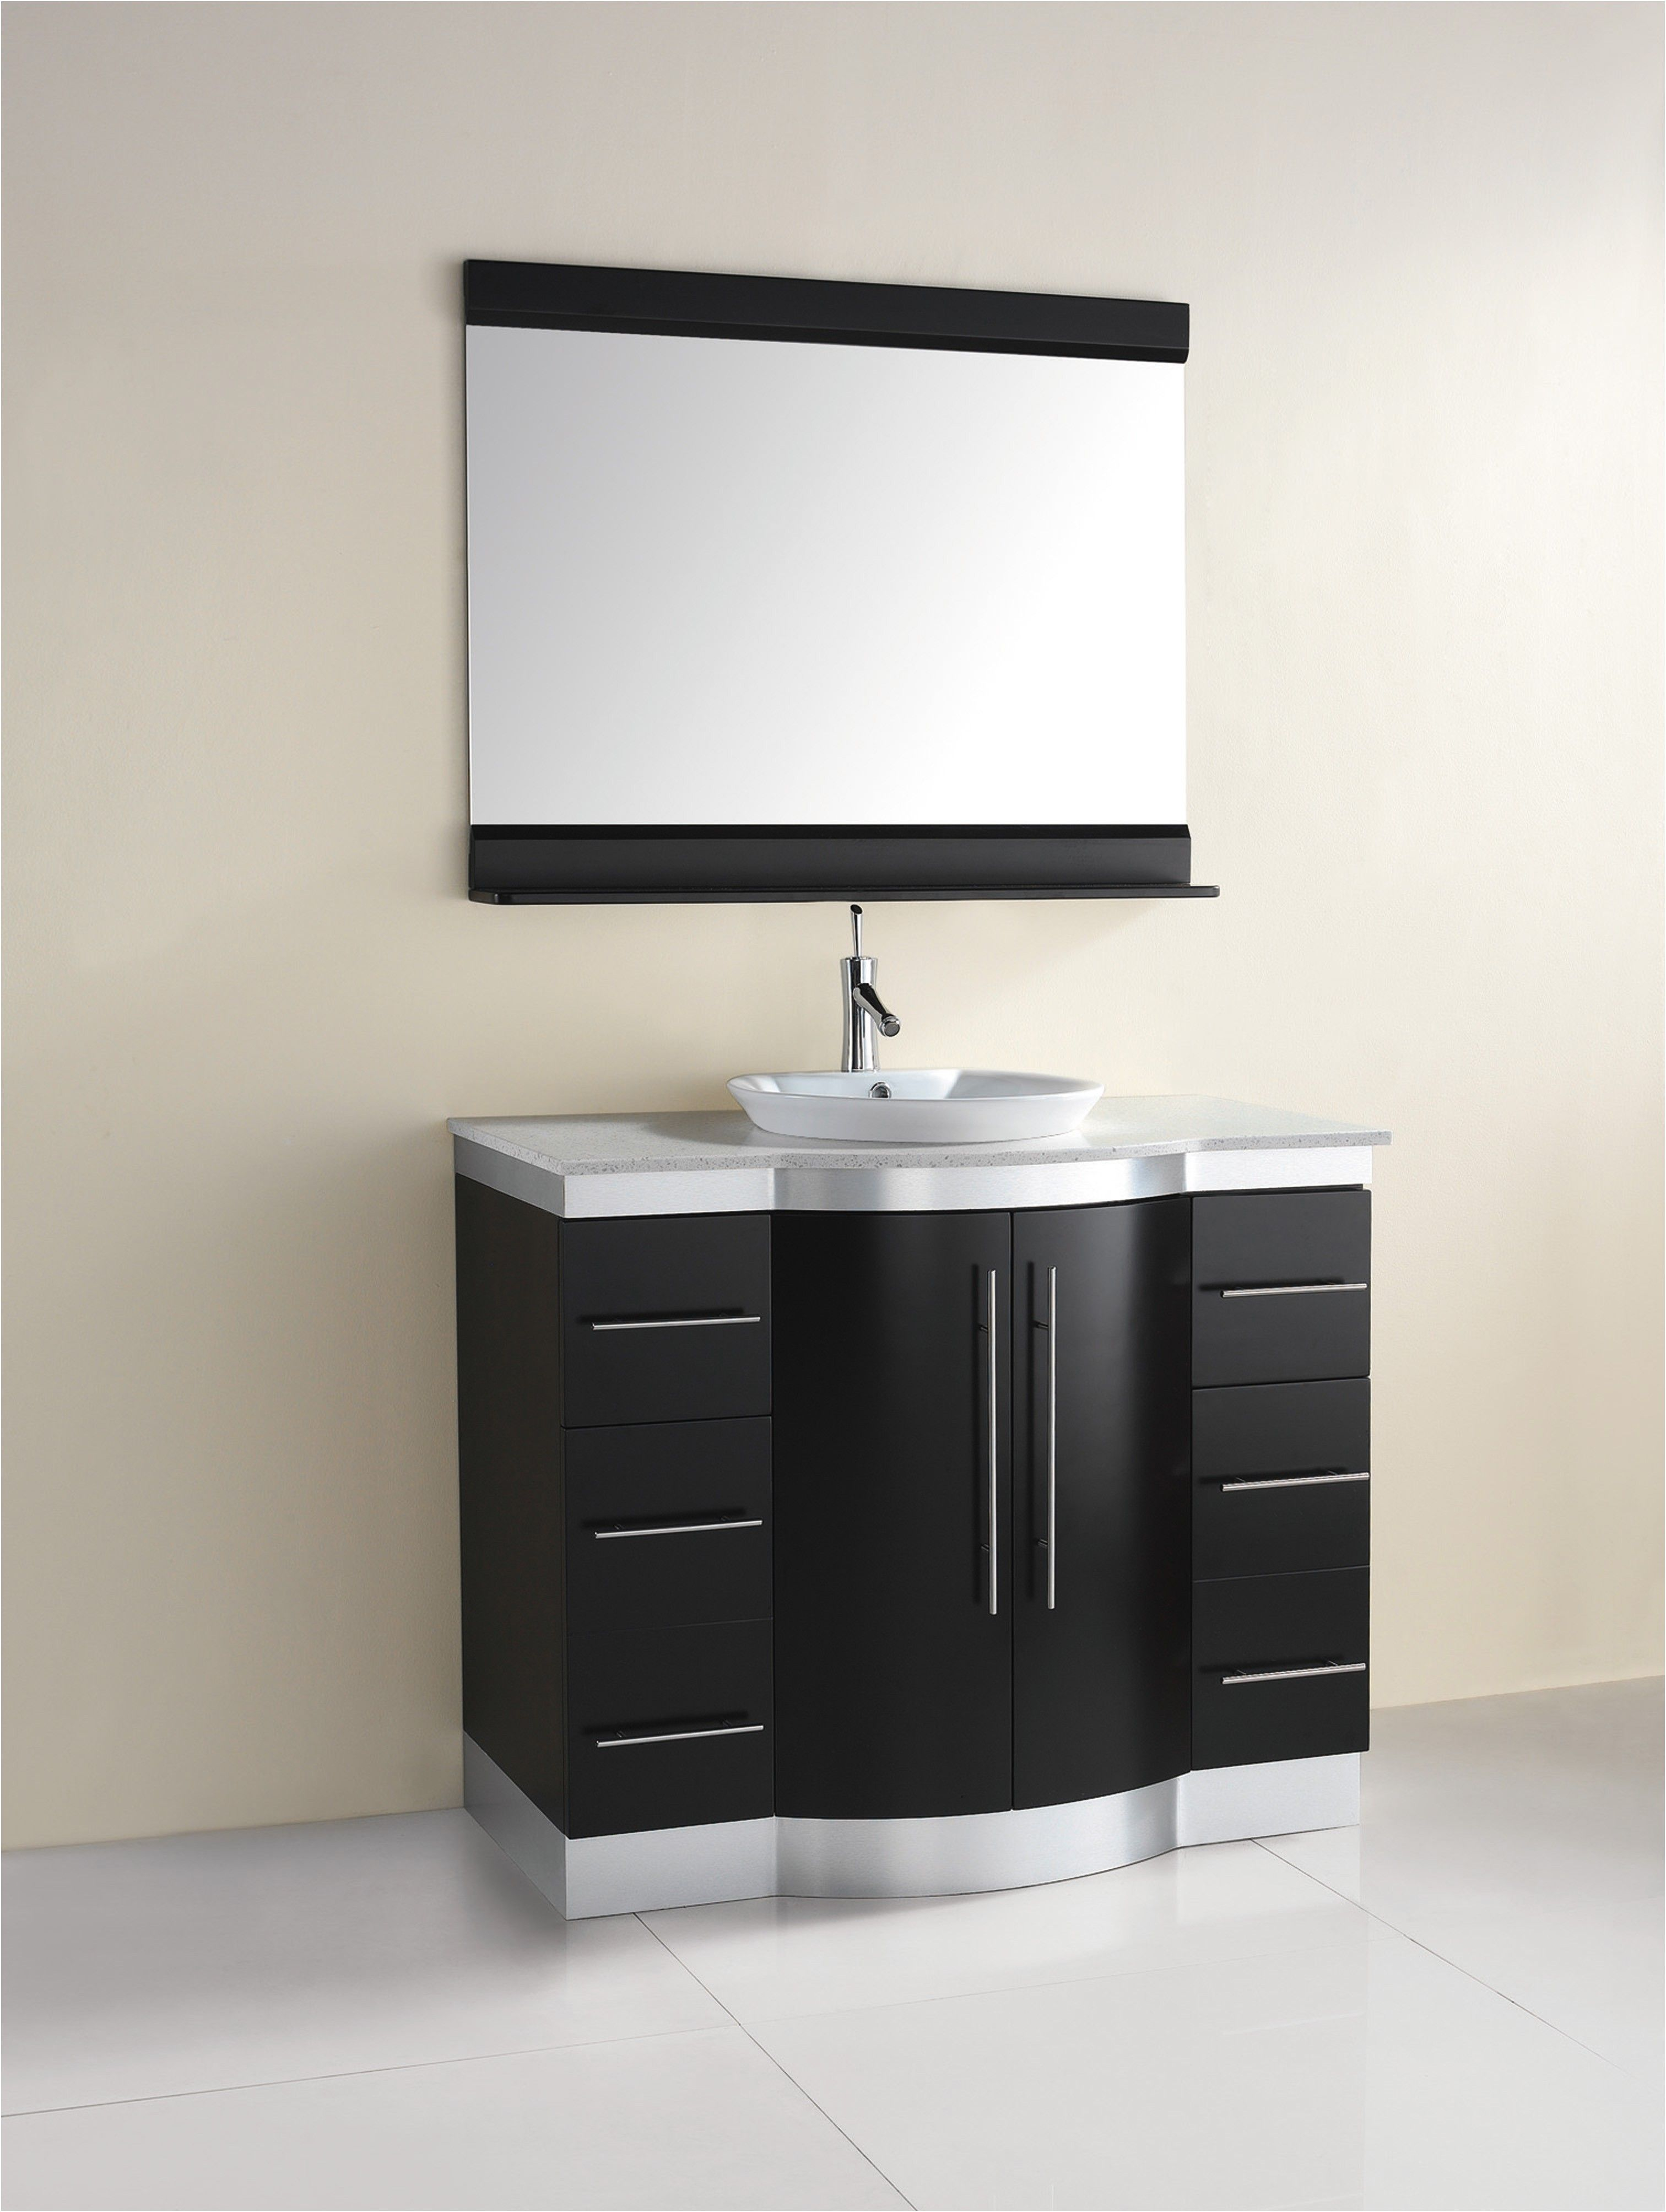 Design A Bathroom Vanity Online New 28 Design A Bathroom Online Design A Bathroom Bathroom From Design Review